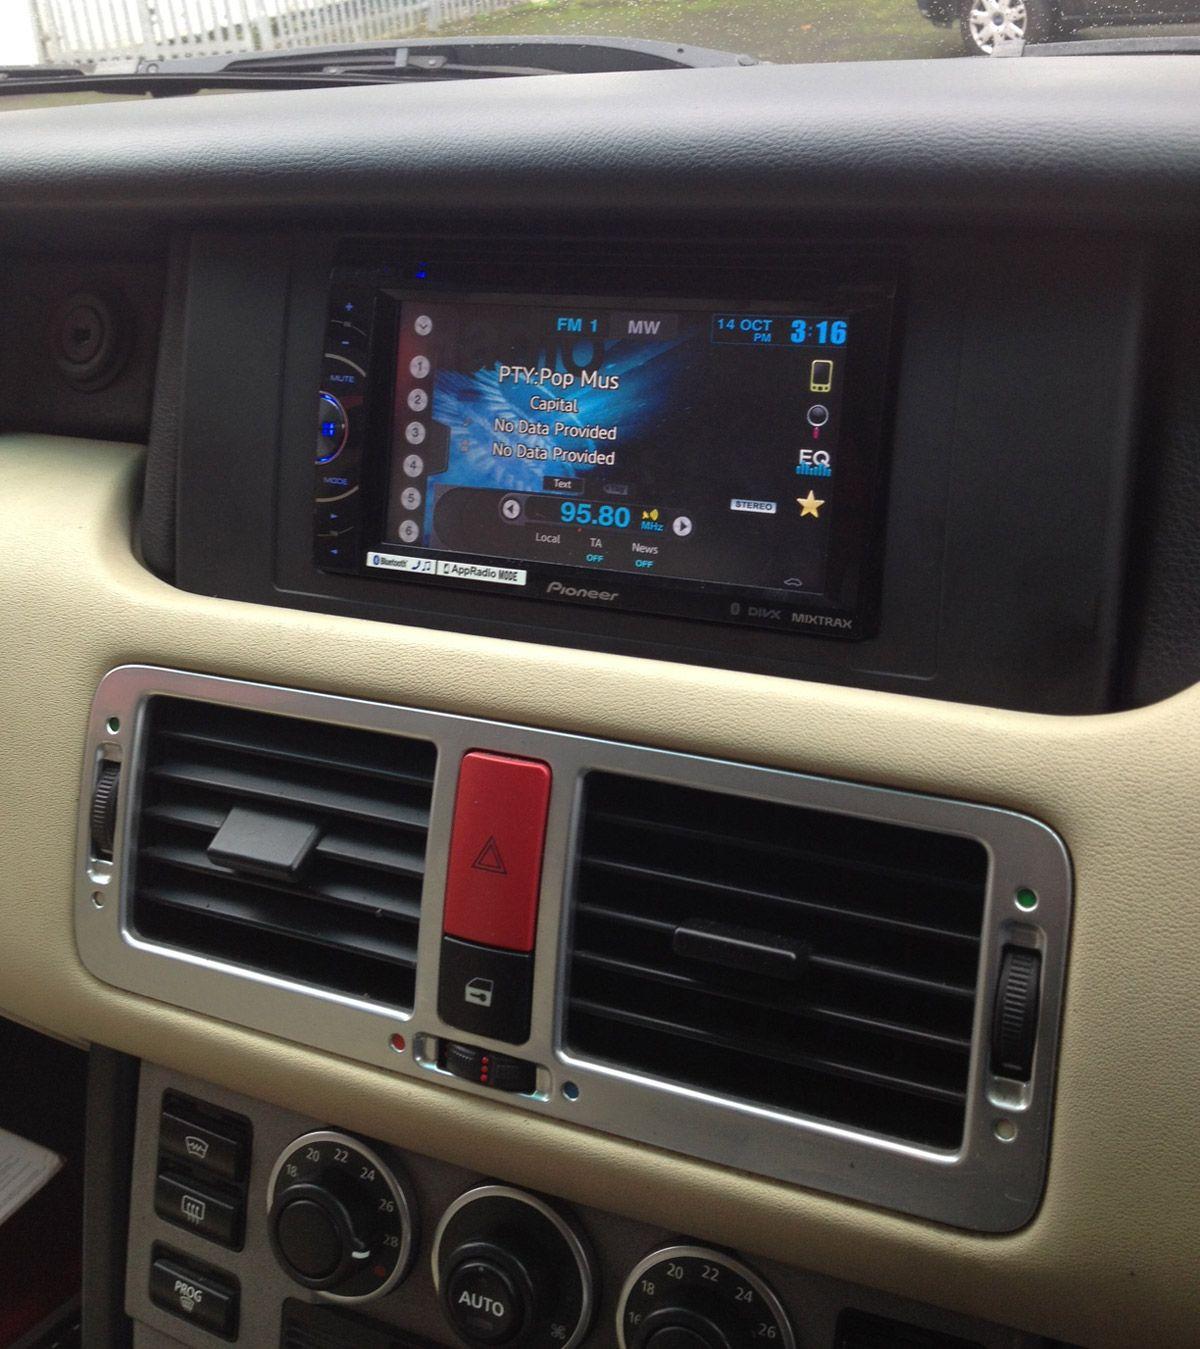 Range Rover Double Din Conversion With Pioneer Avh X2600bt Dvd Bluetooth Stereo Avh Range Rover Car Radio